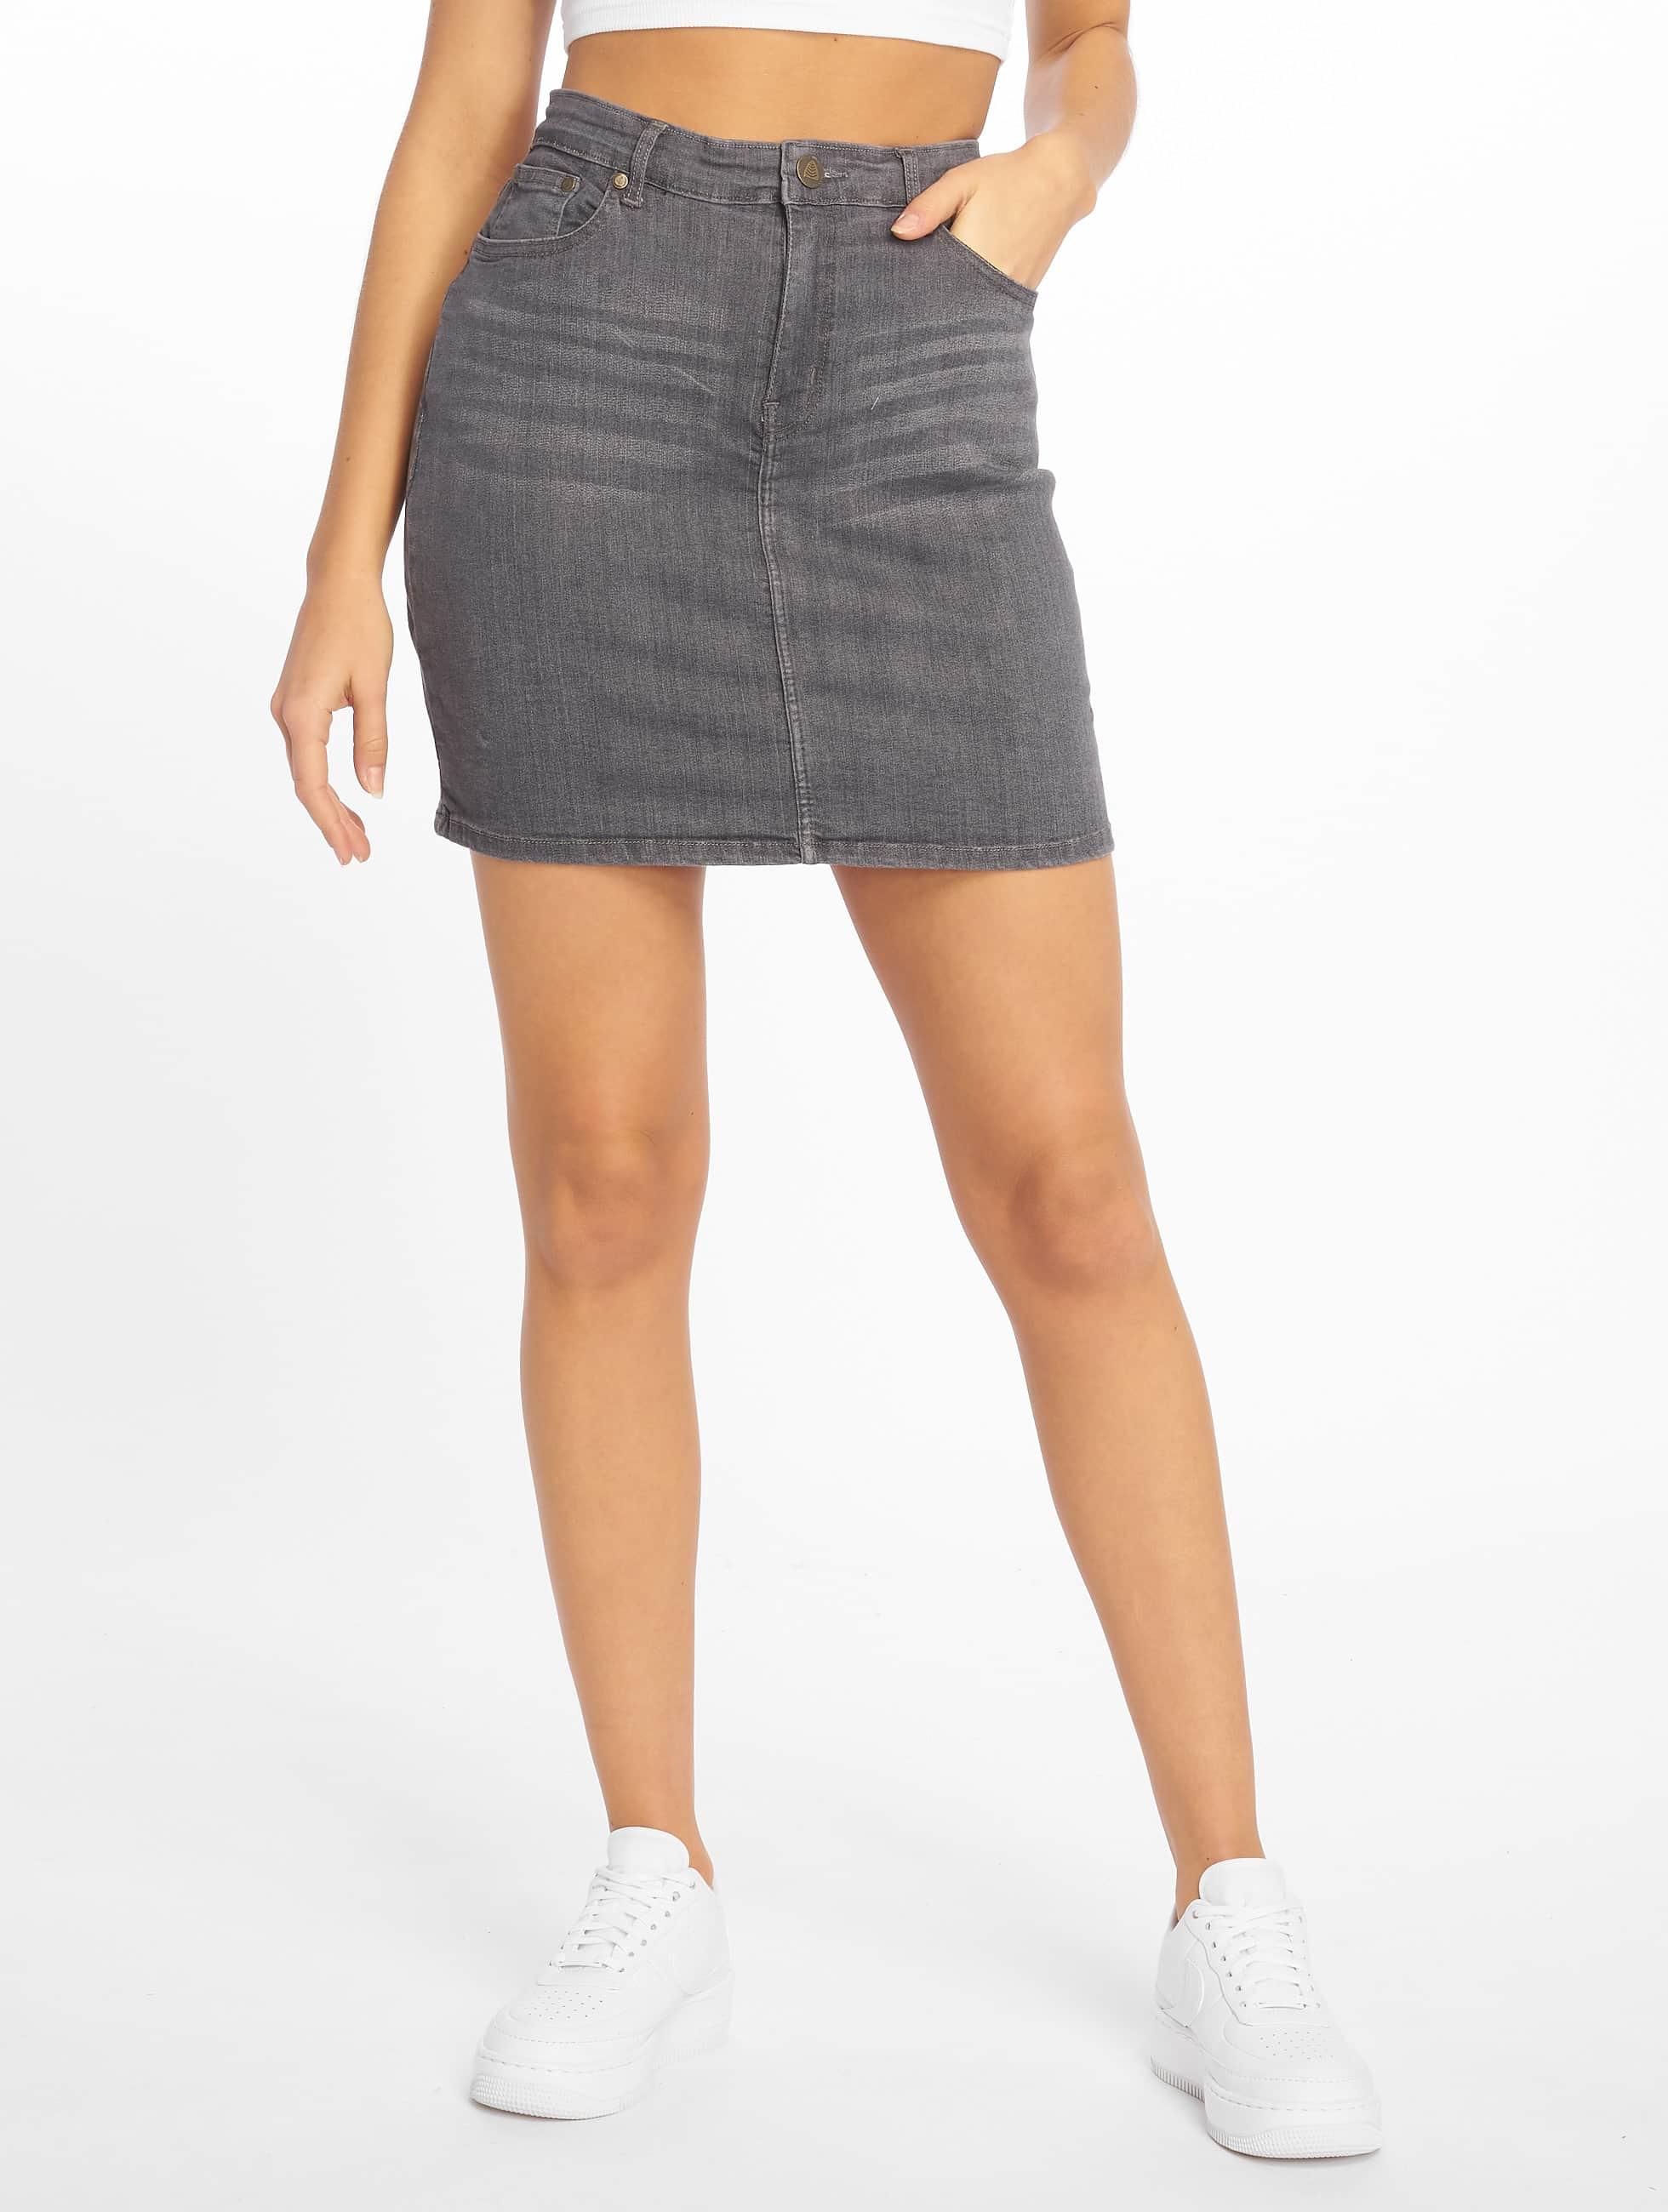 Just Rhyse / Skirt Roseville in grey XL